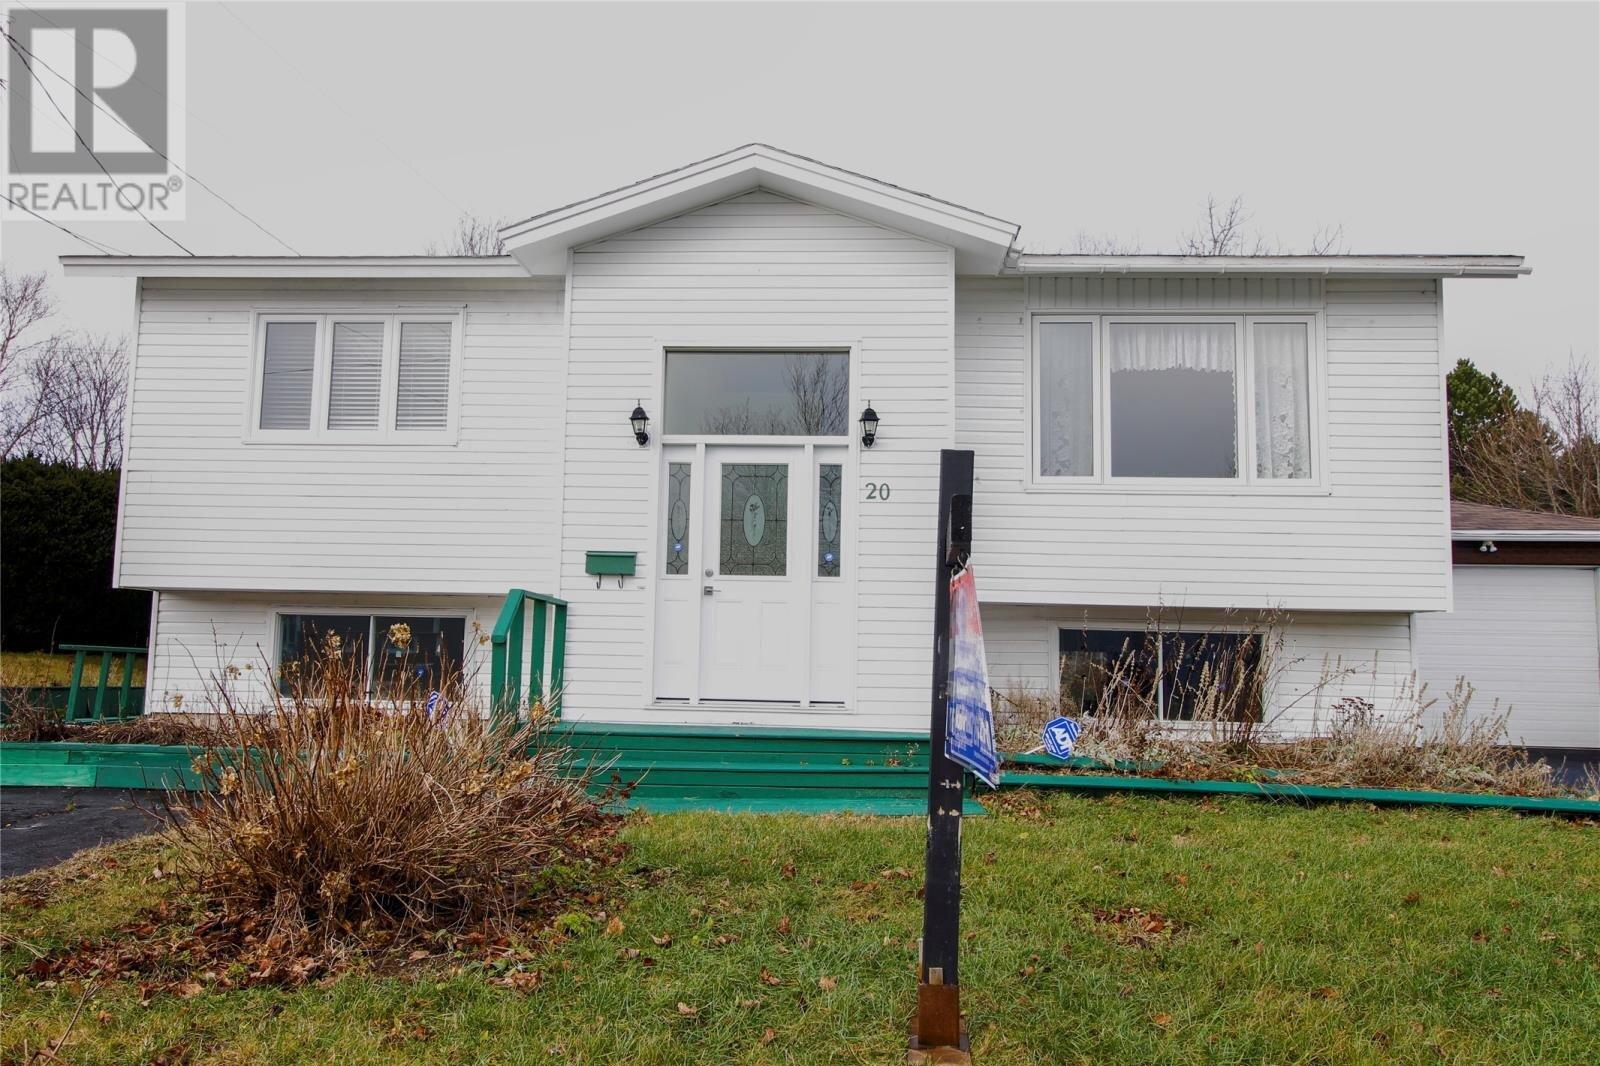 House for sale at 20 Spratt Pl St John's Newfoundland - MLS: 1224555